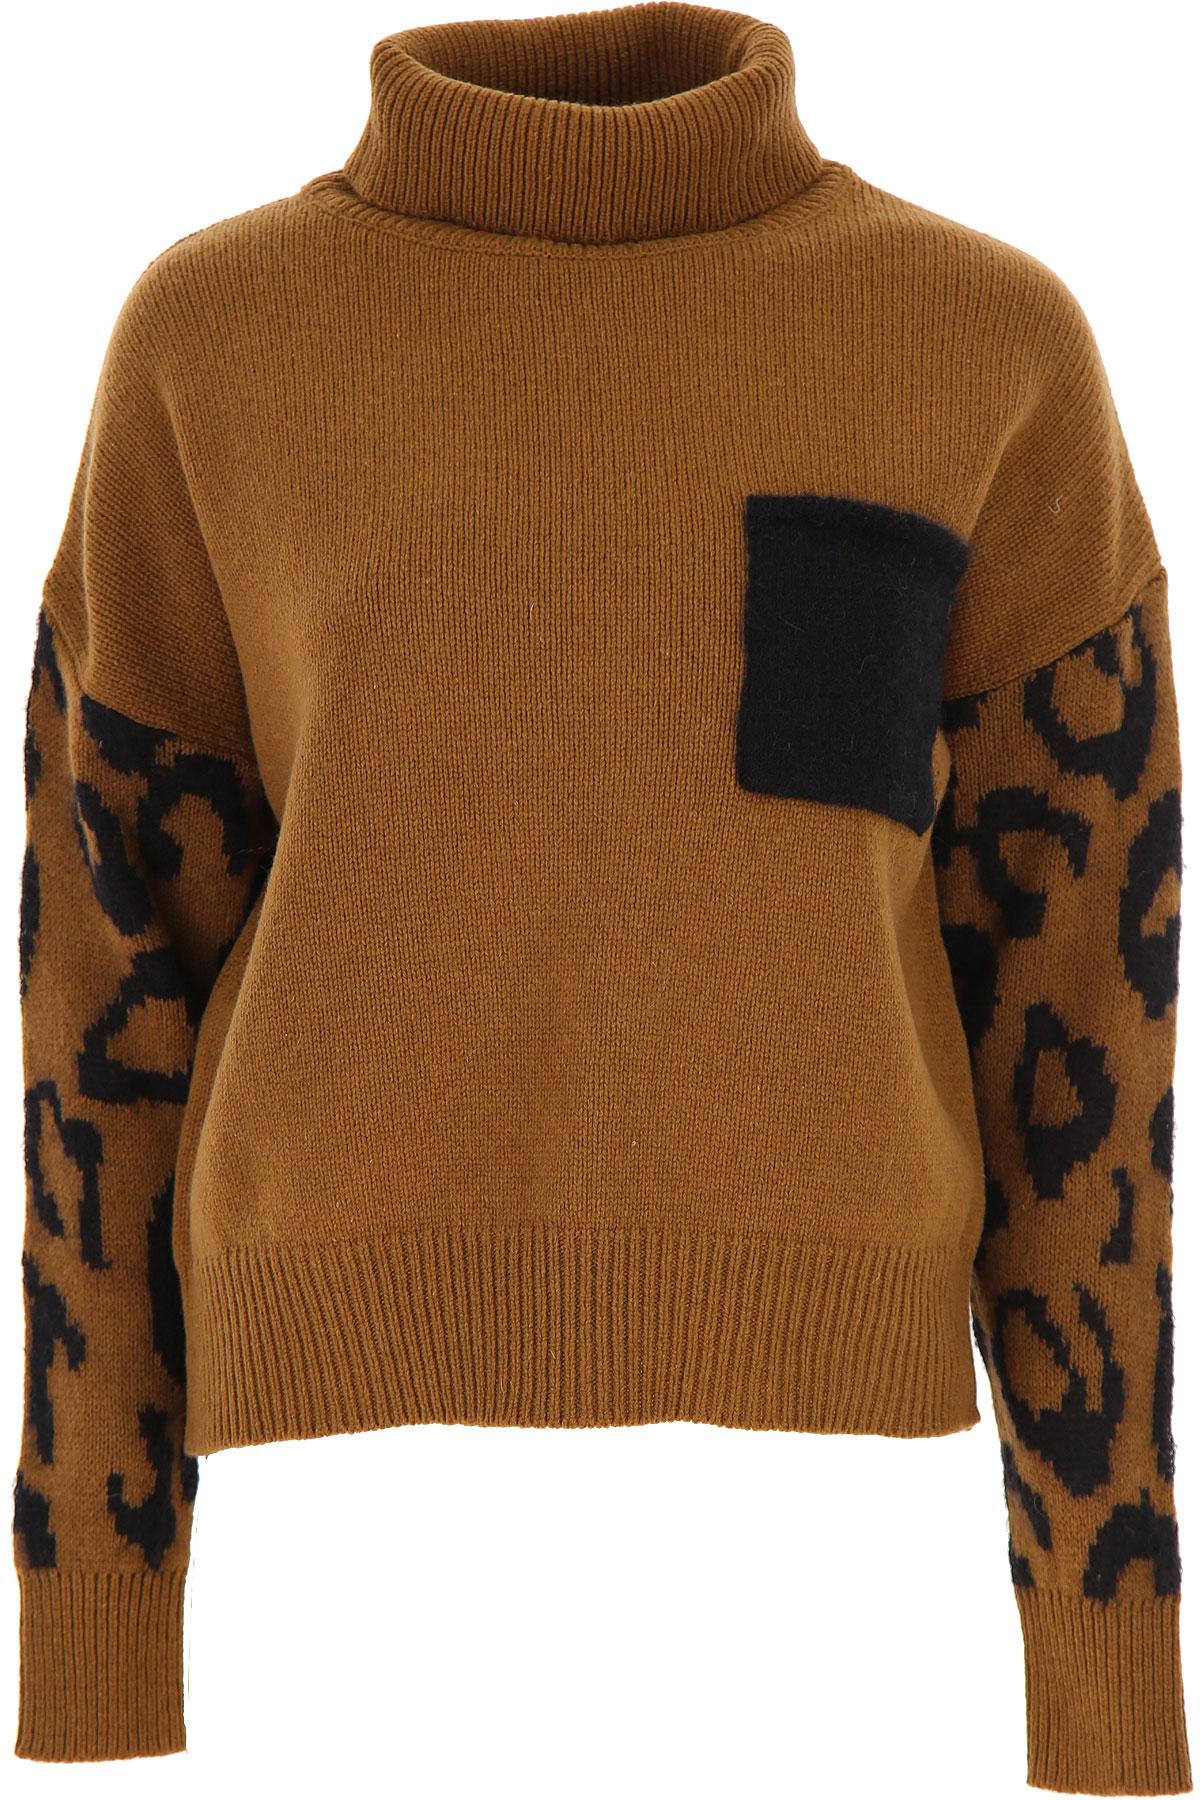 ALYSI Sweater for Women Jumper On Sale, Brown, Wool, 2019, 4 6